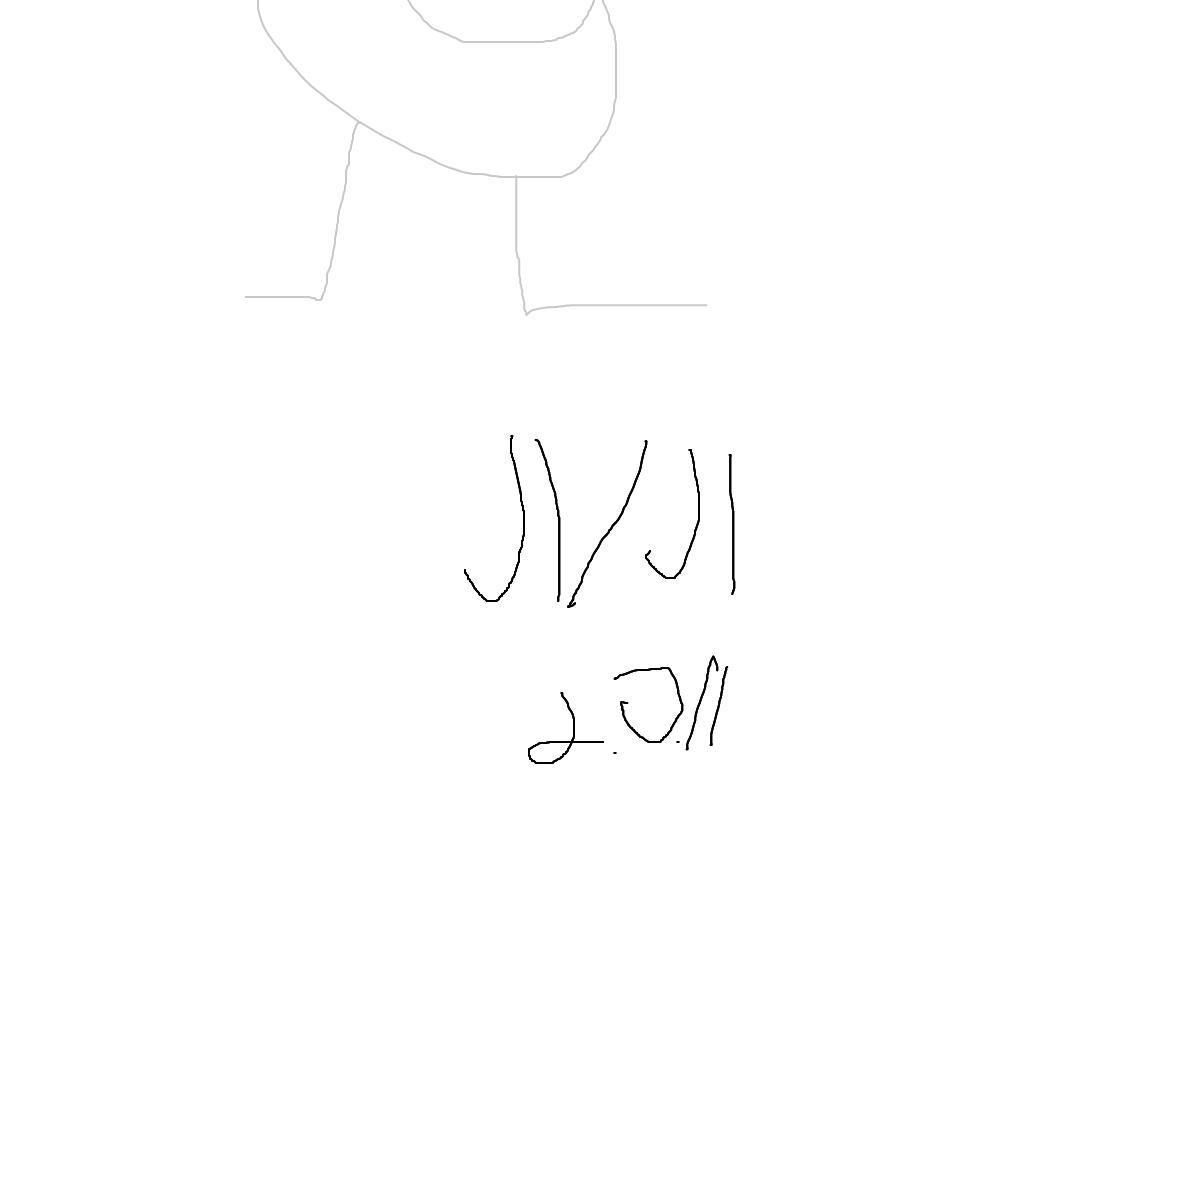 BAAAM drawing#14269 lat:83.6608428955078100lng: -33.3754196166992200